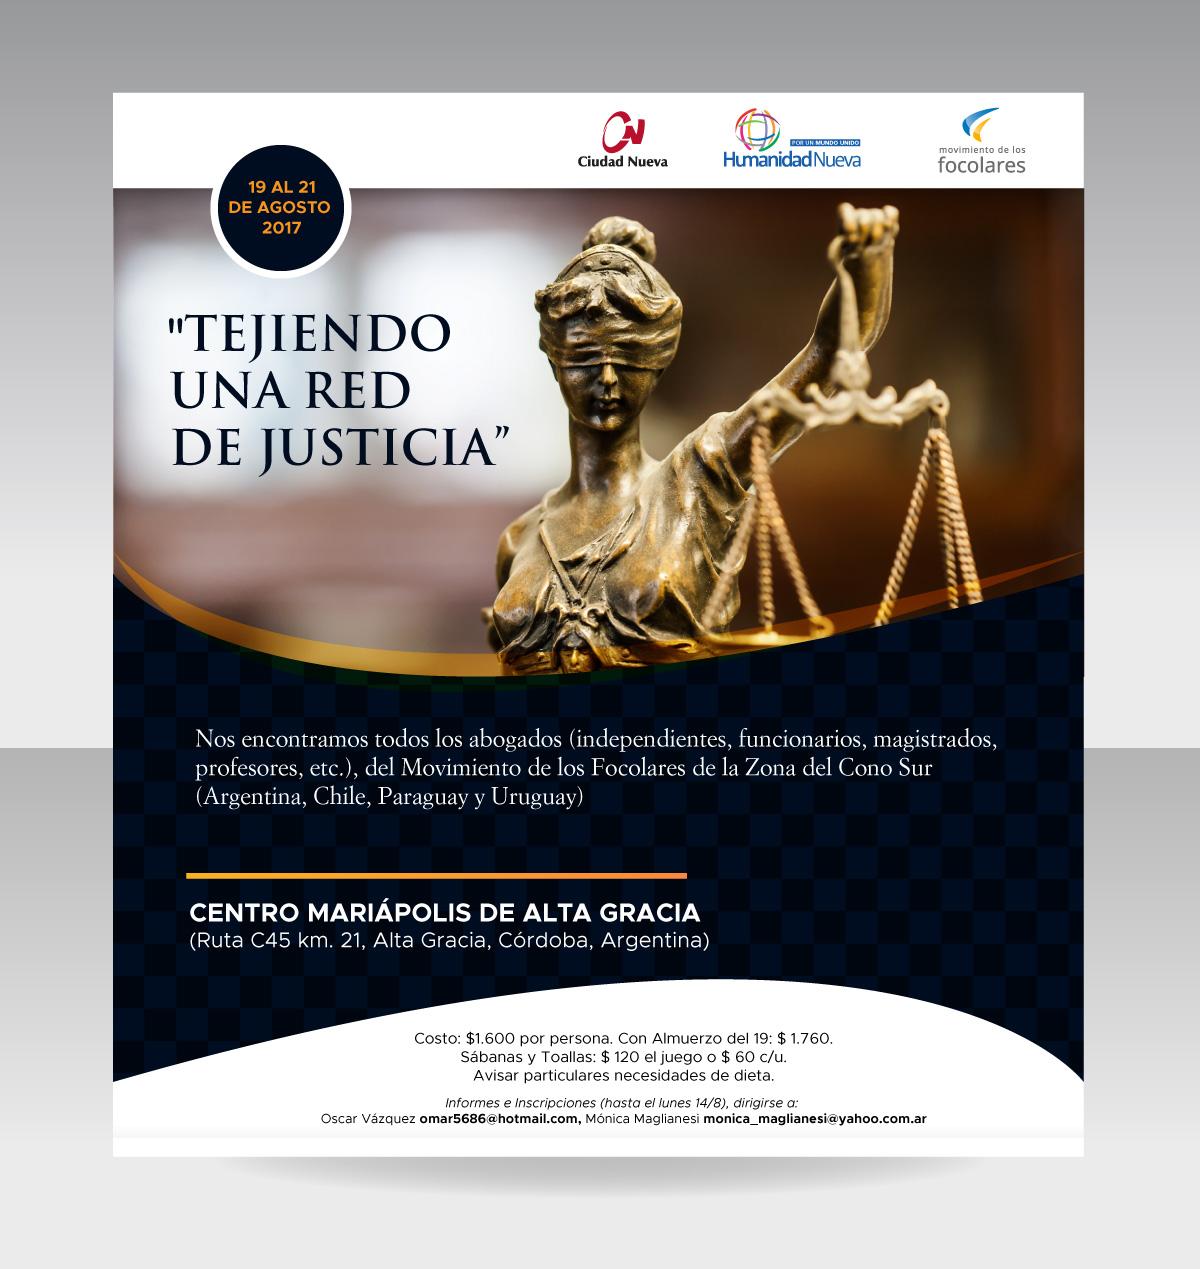 invitacion_HN_justicia